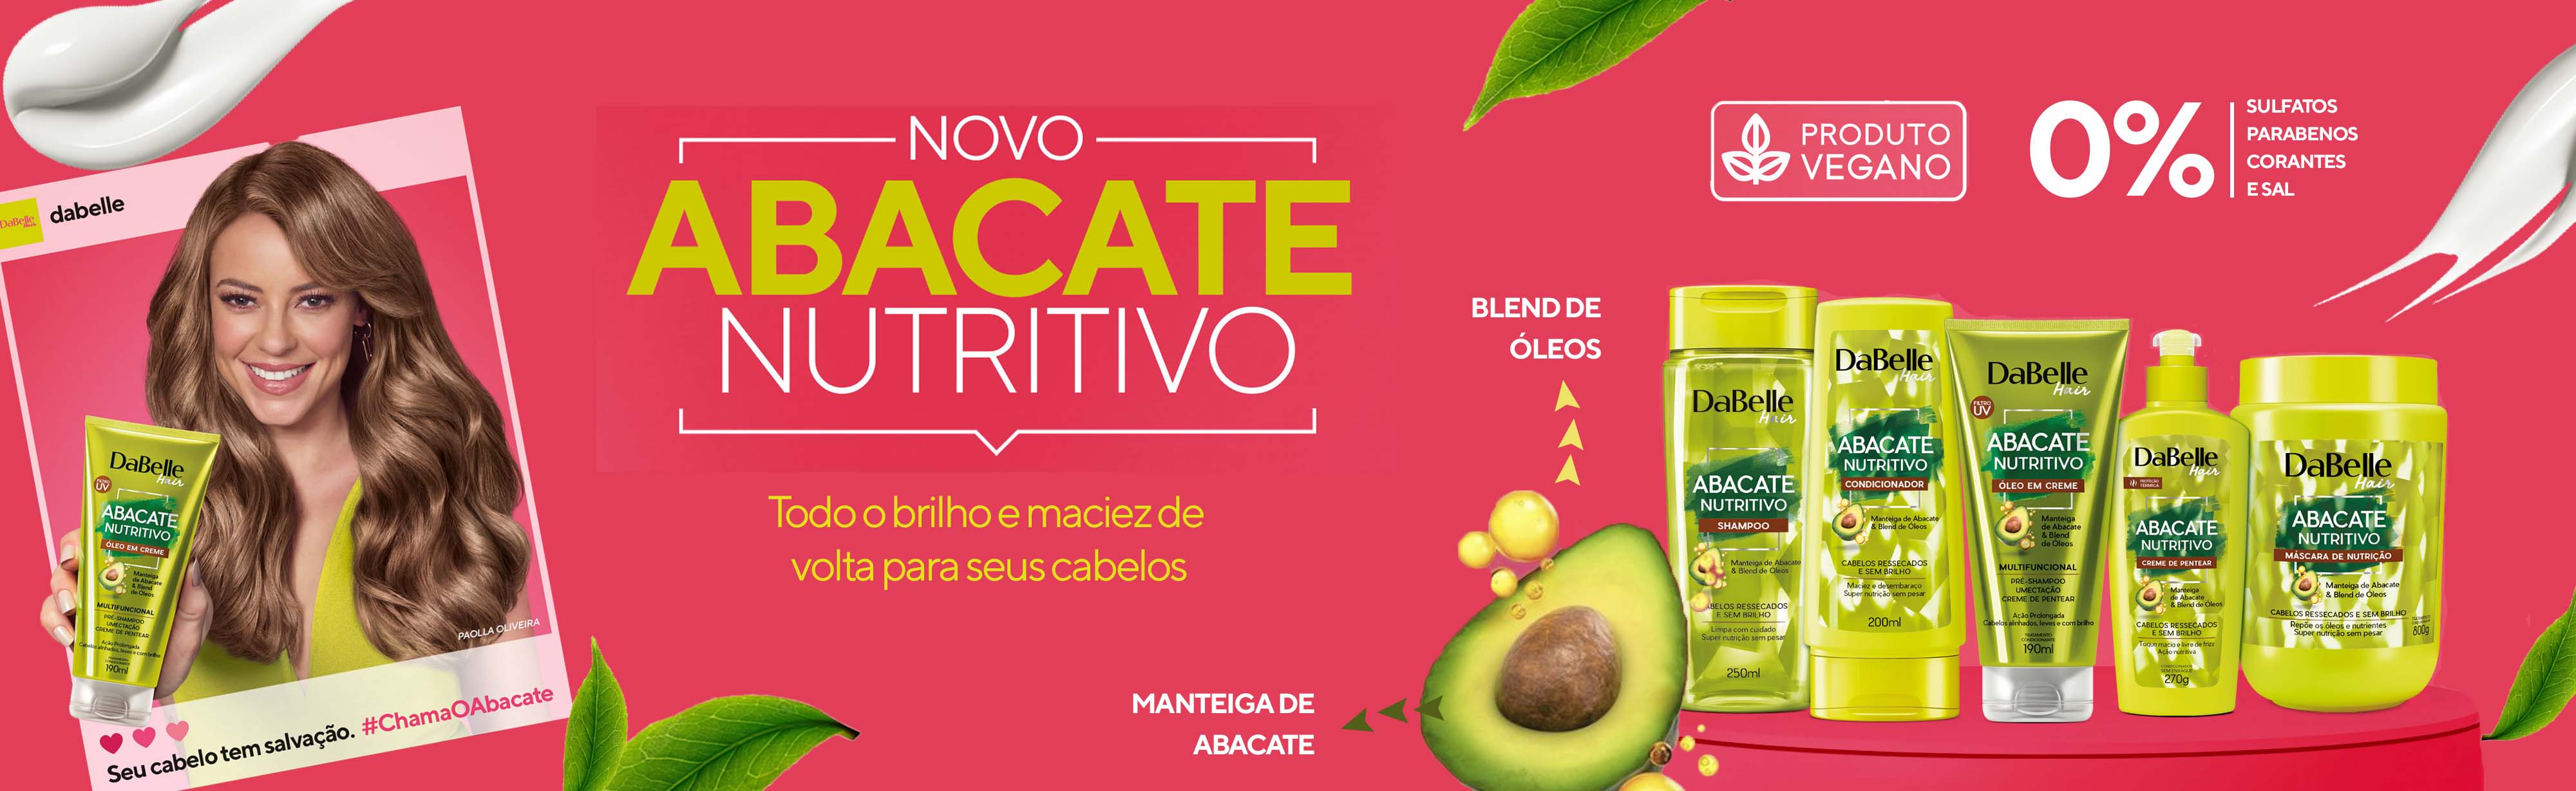 Abacate Nutritivo